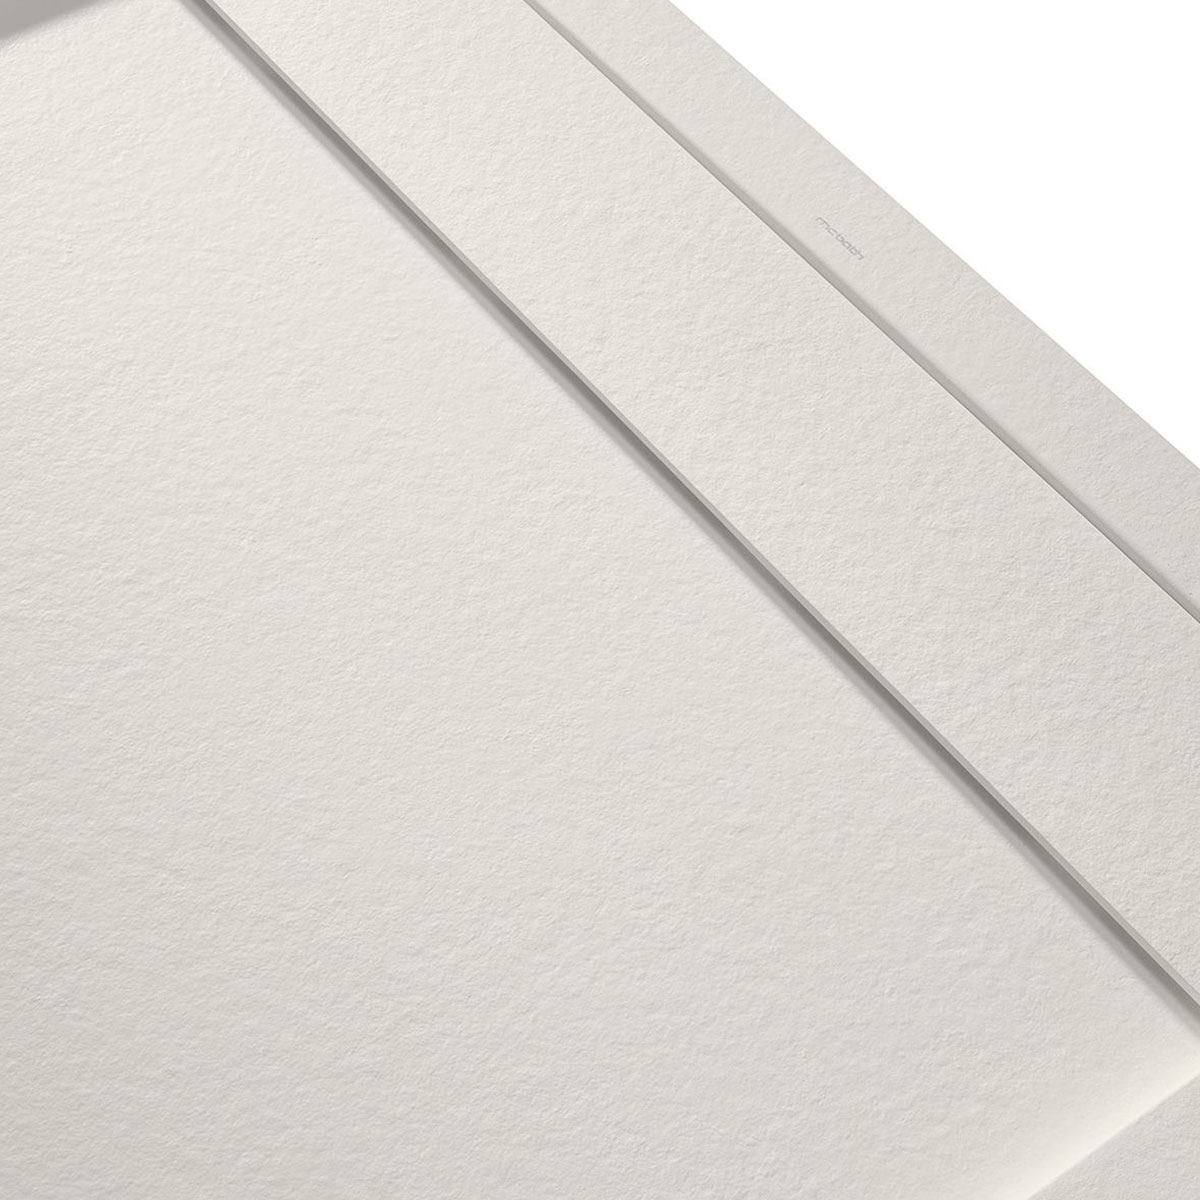 Plato de ducha rectangular 120x80 Andrómeda Stone Cover Marfil